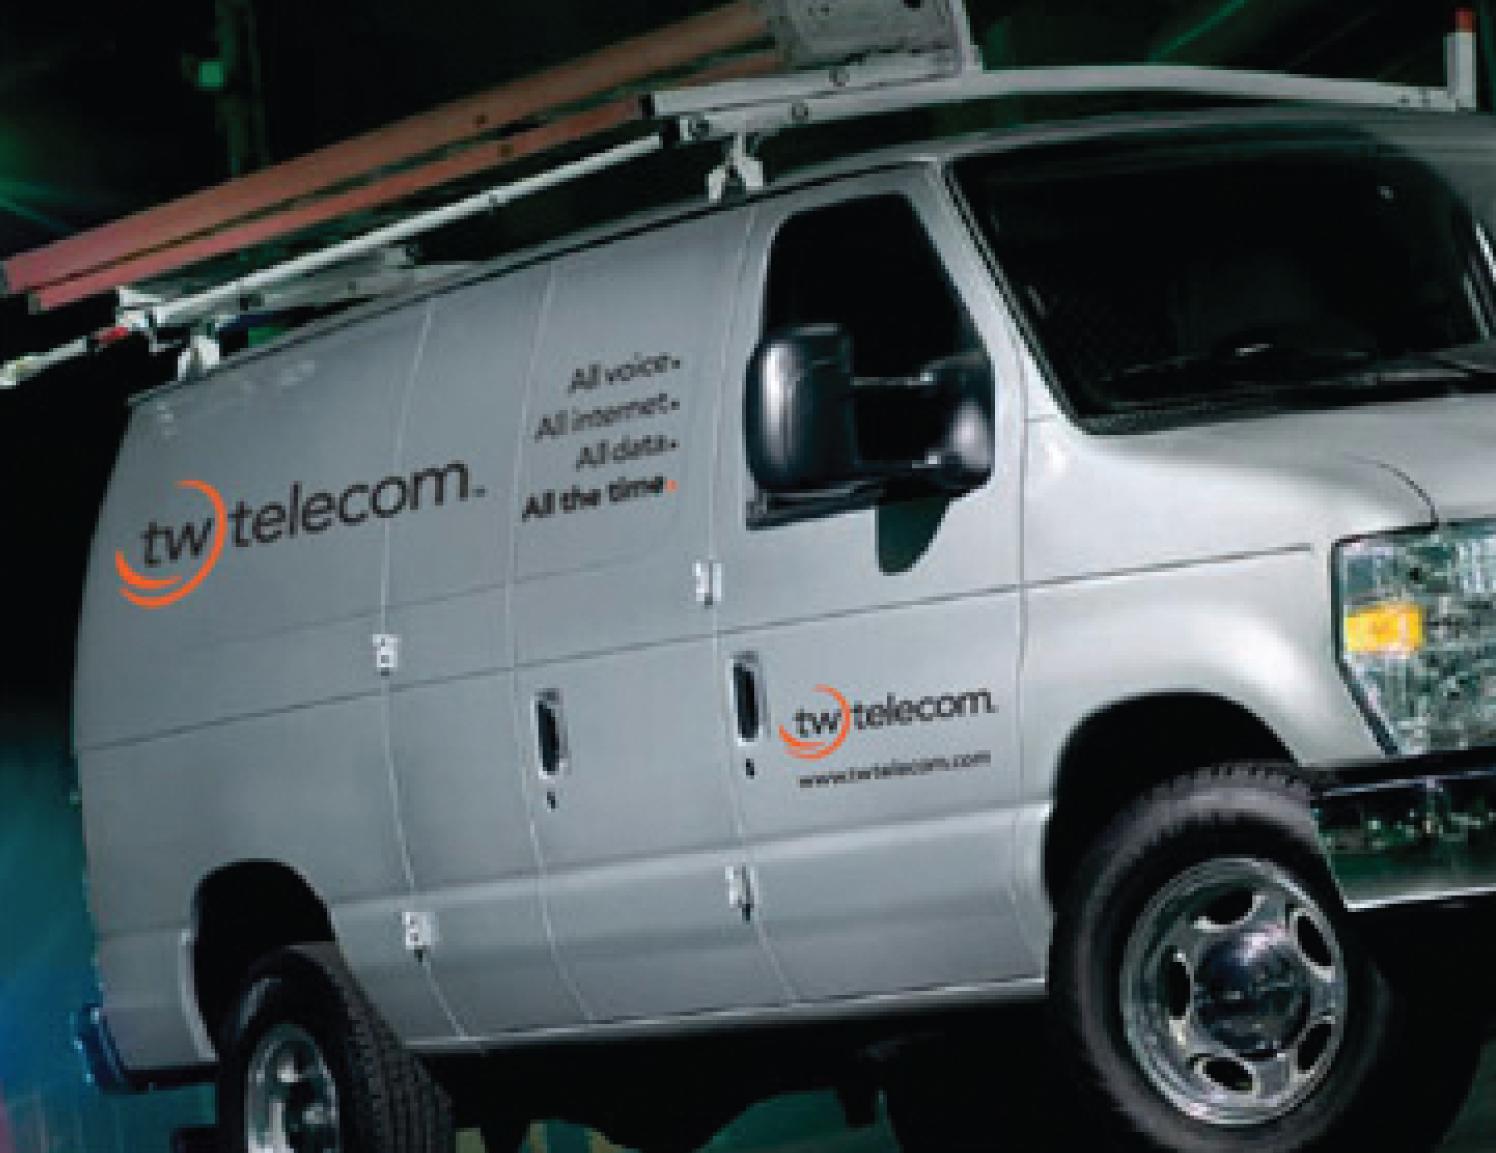 tw telecom logo example